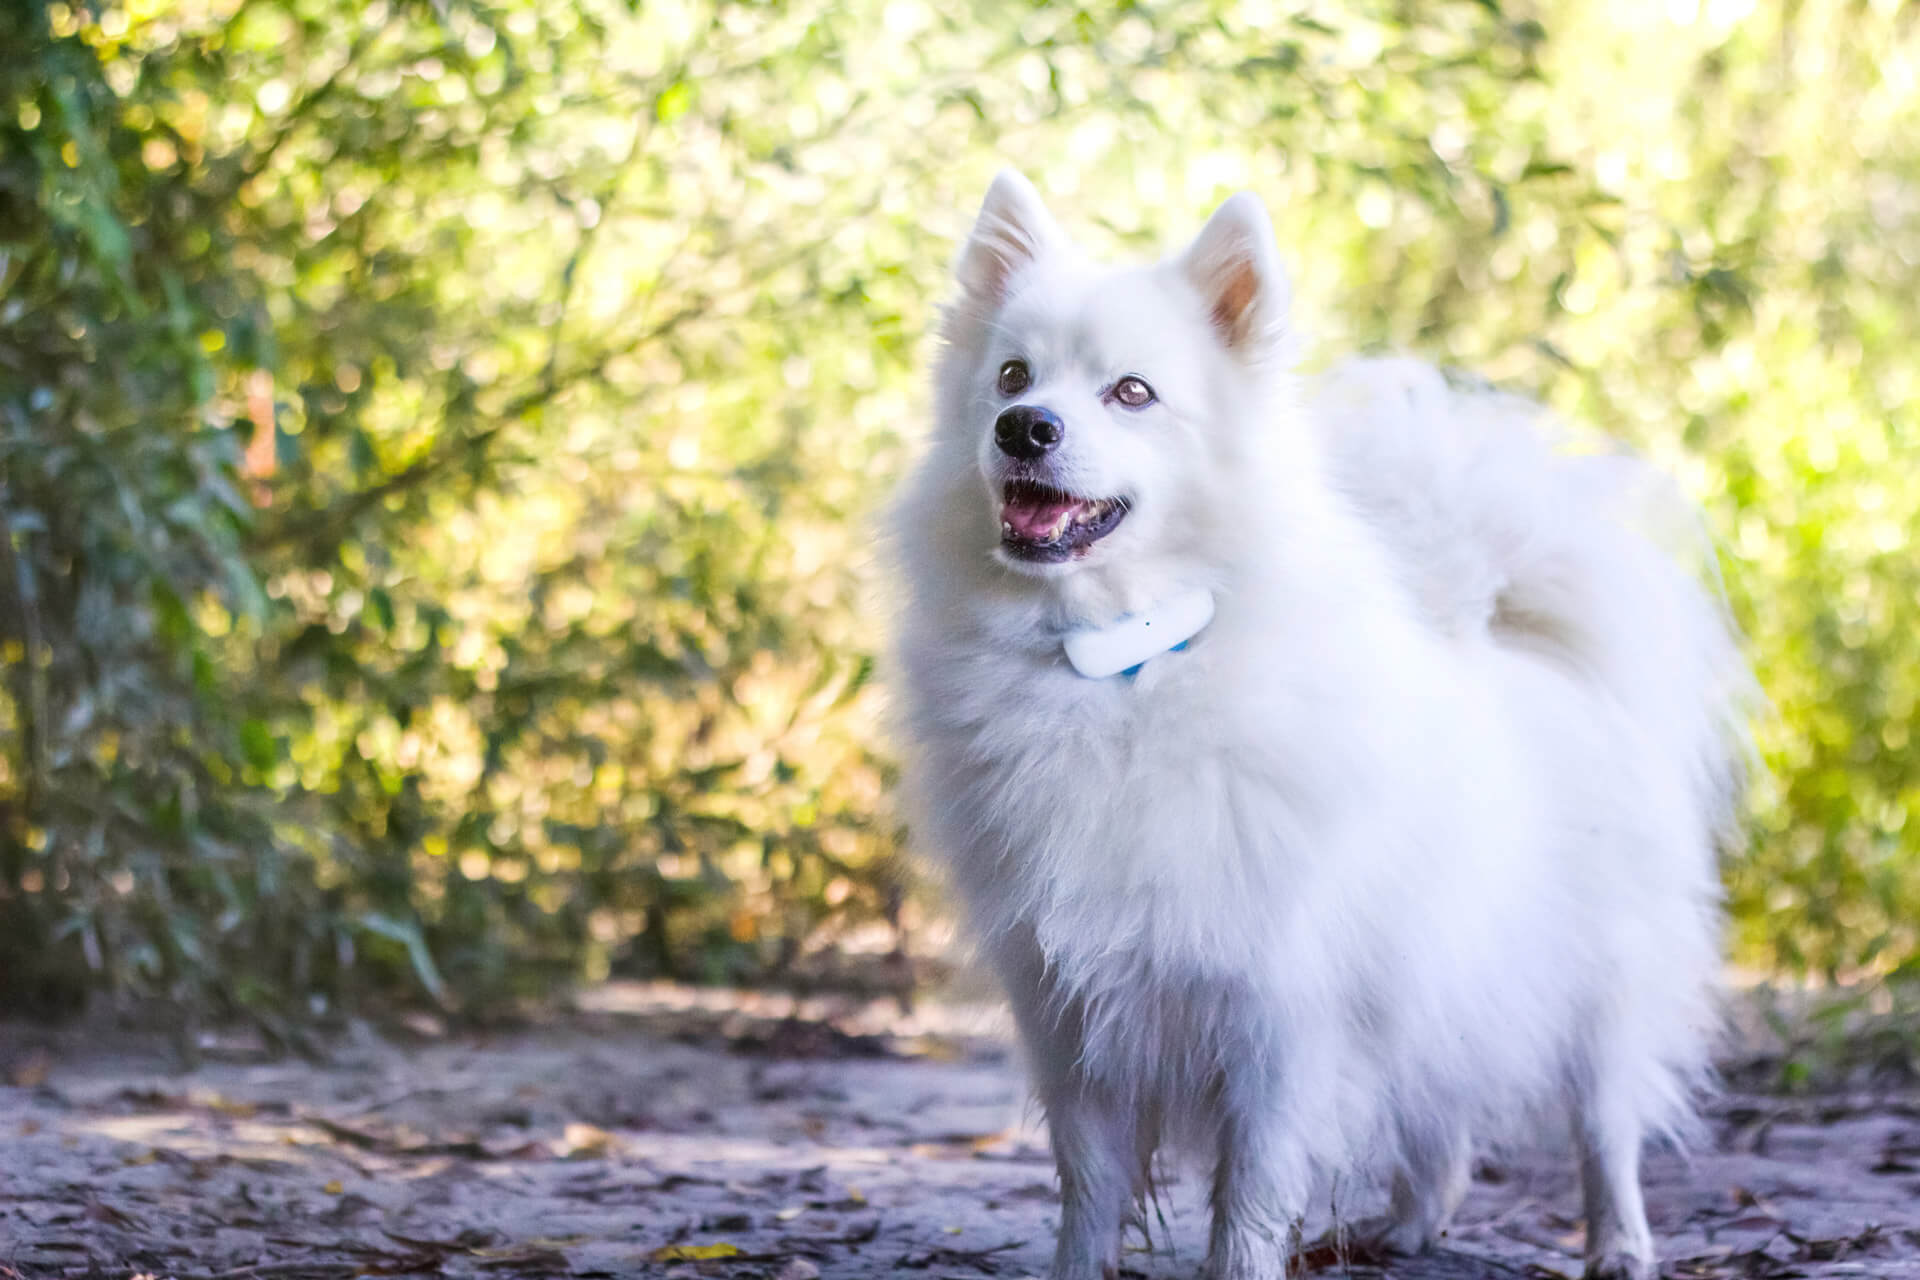 white dog wearing GPS tracker outdoors